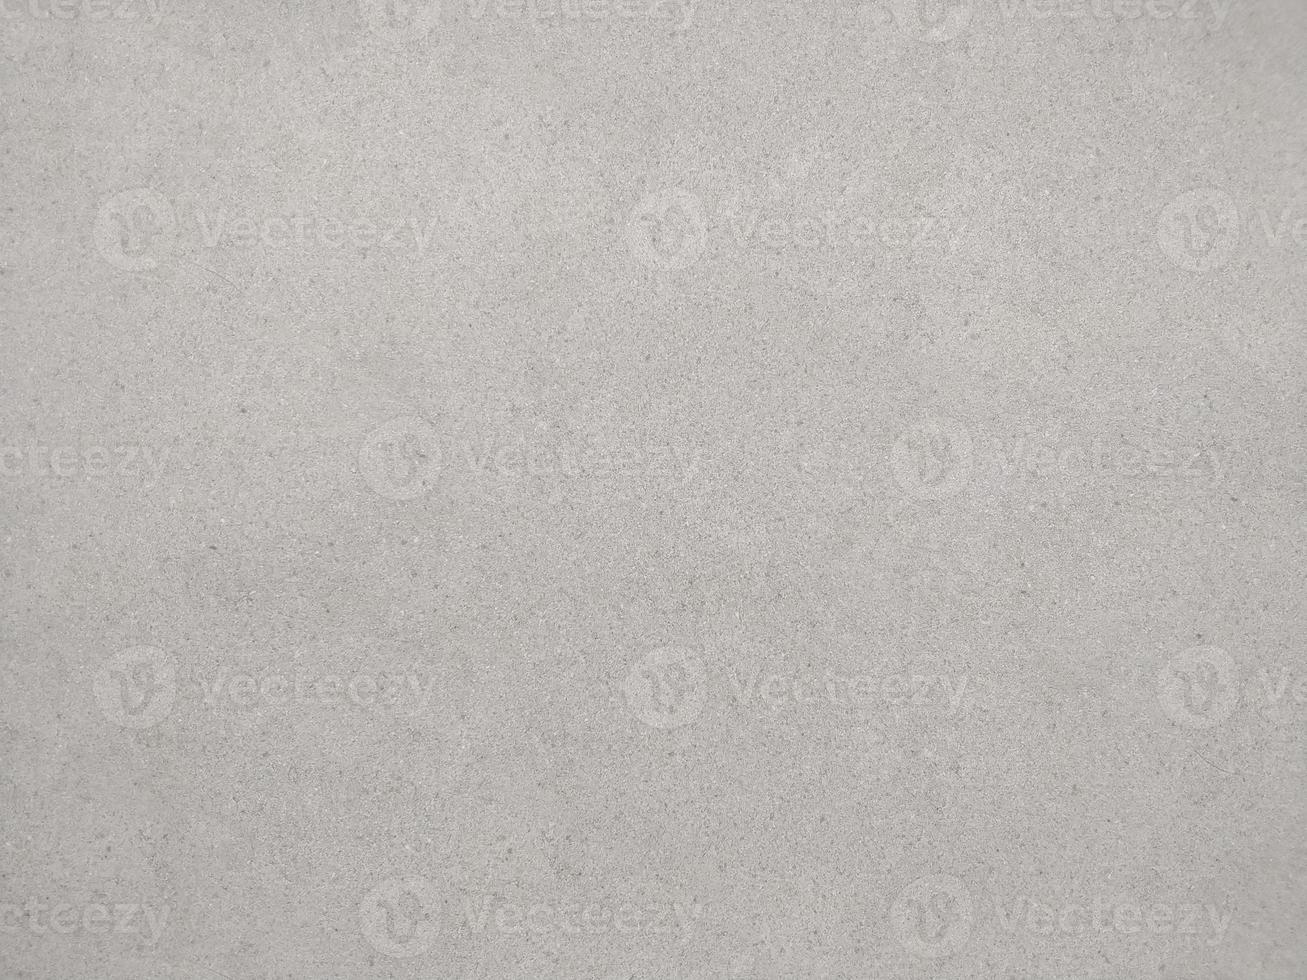 textura cemento gris foto